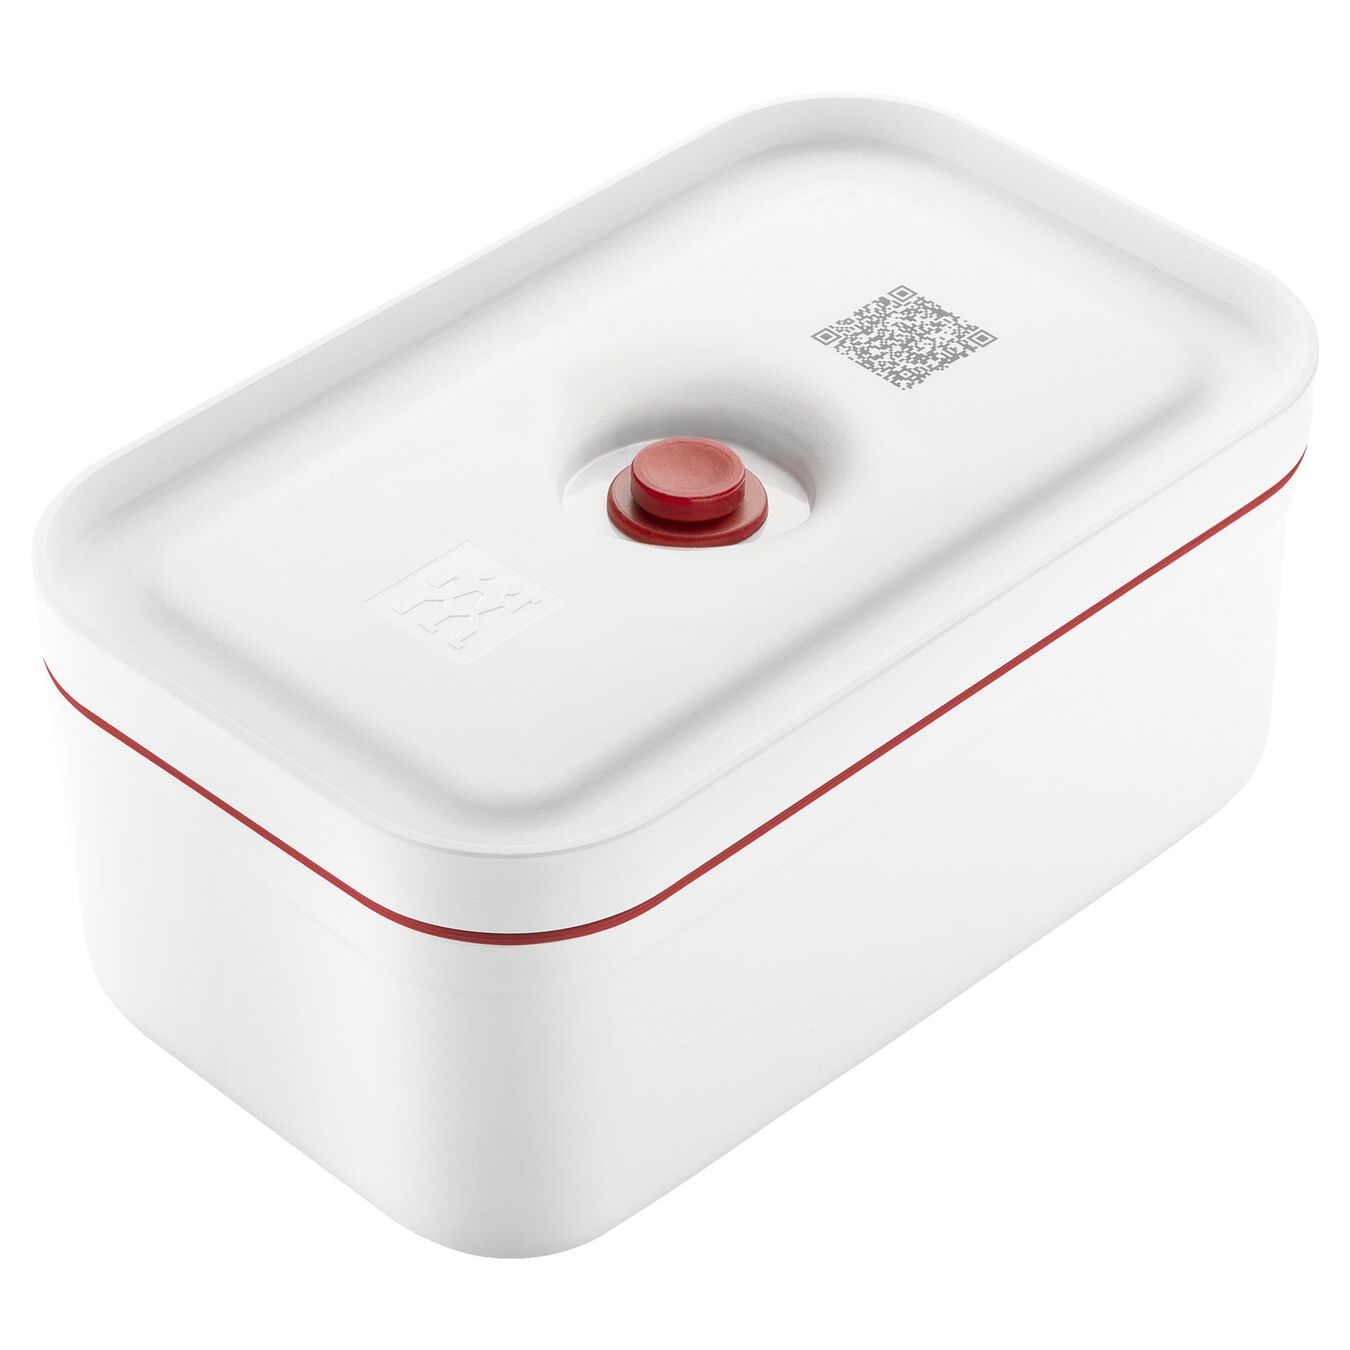 Vakuum Lunchbox, M, Kunststoff, Weiß-Rot,,large 1